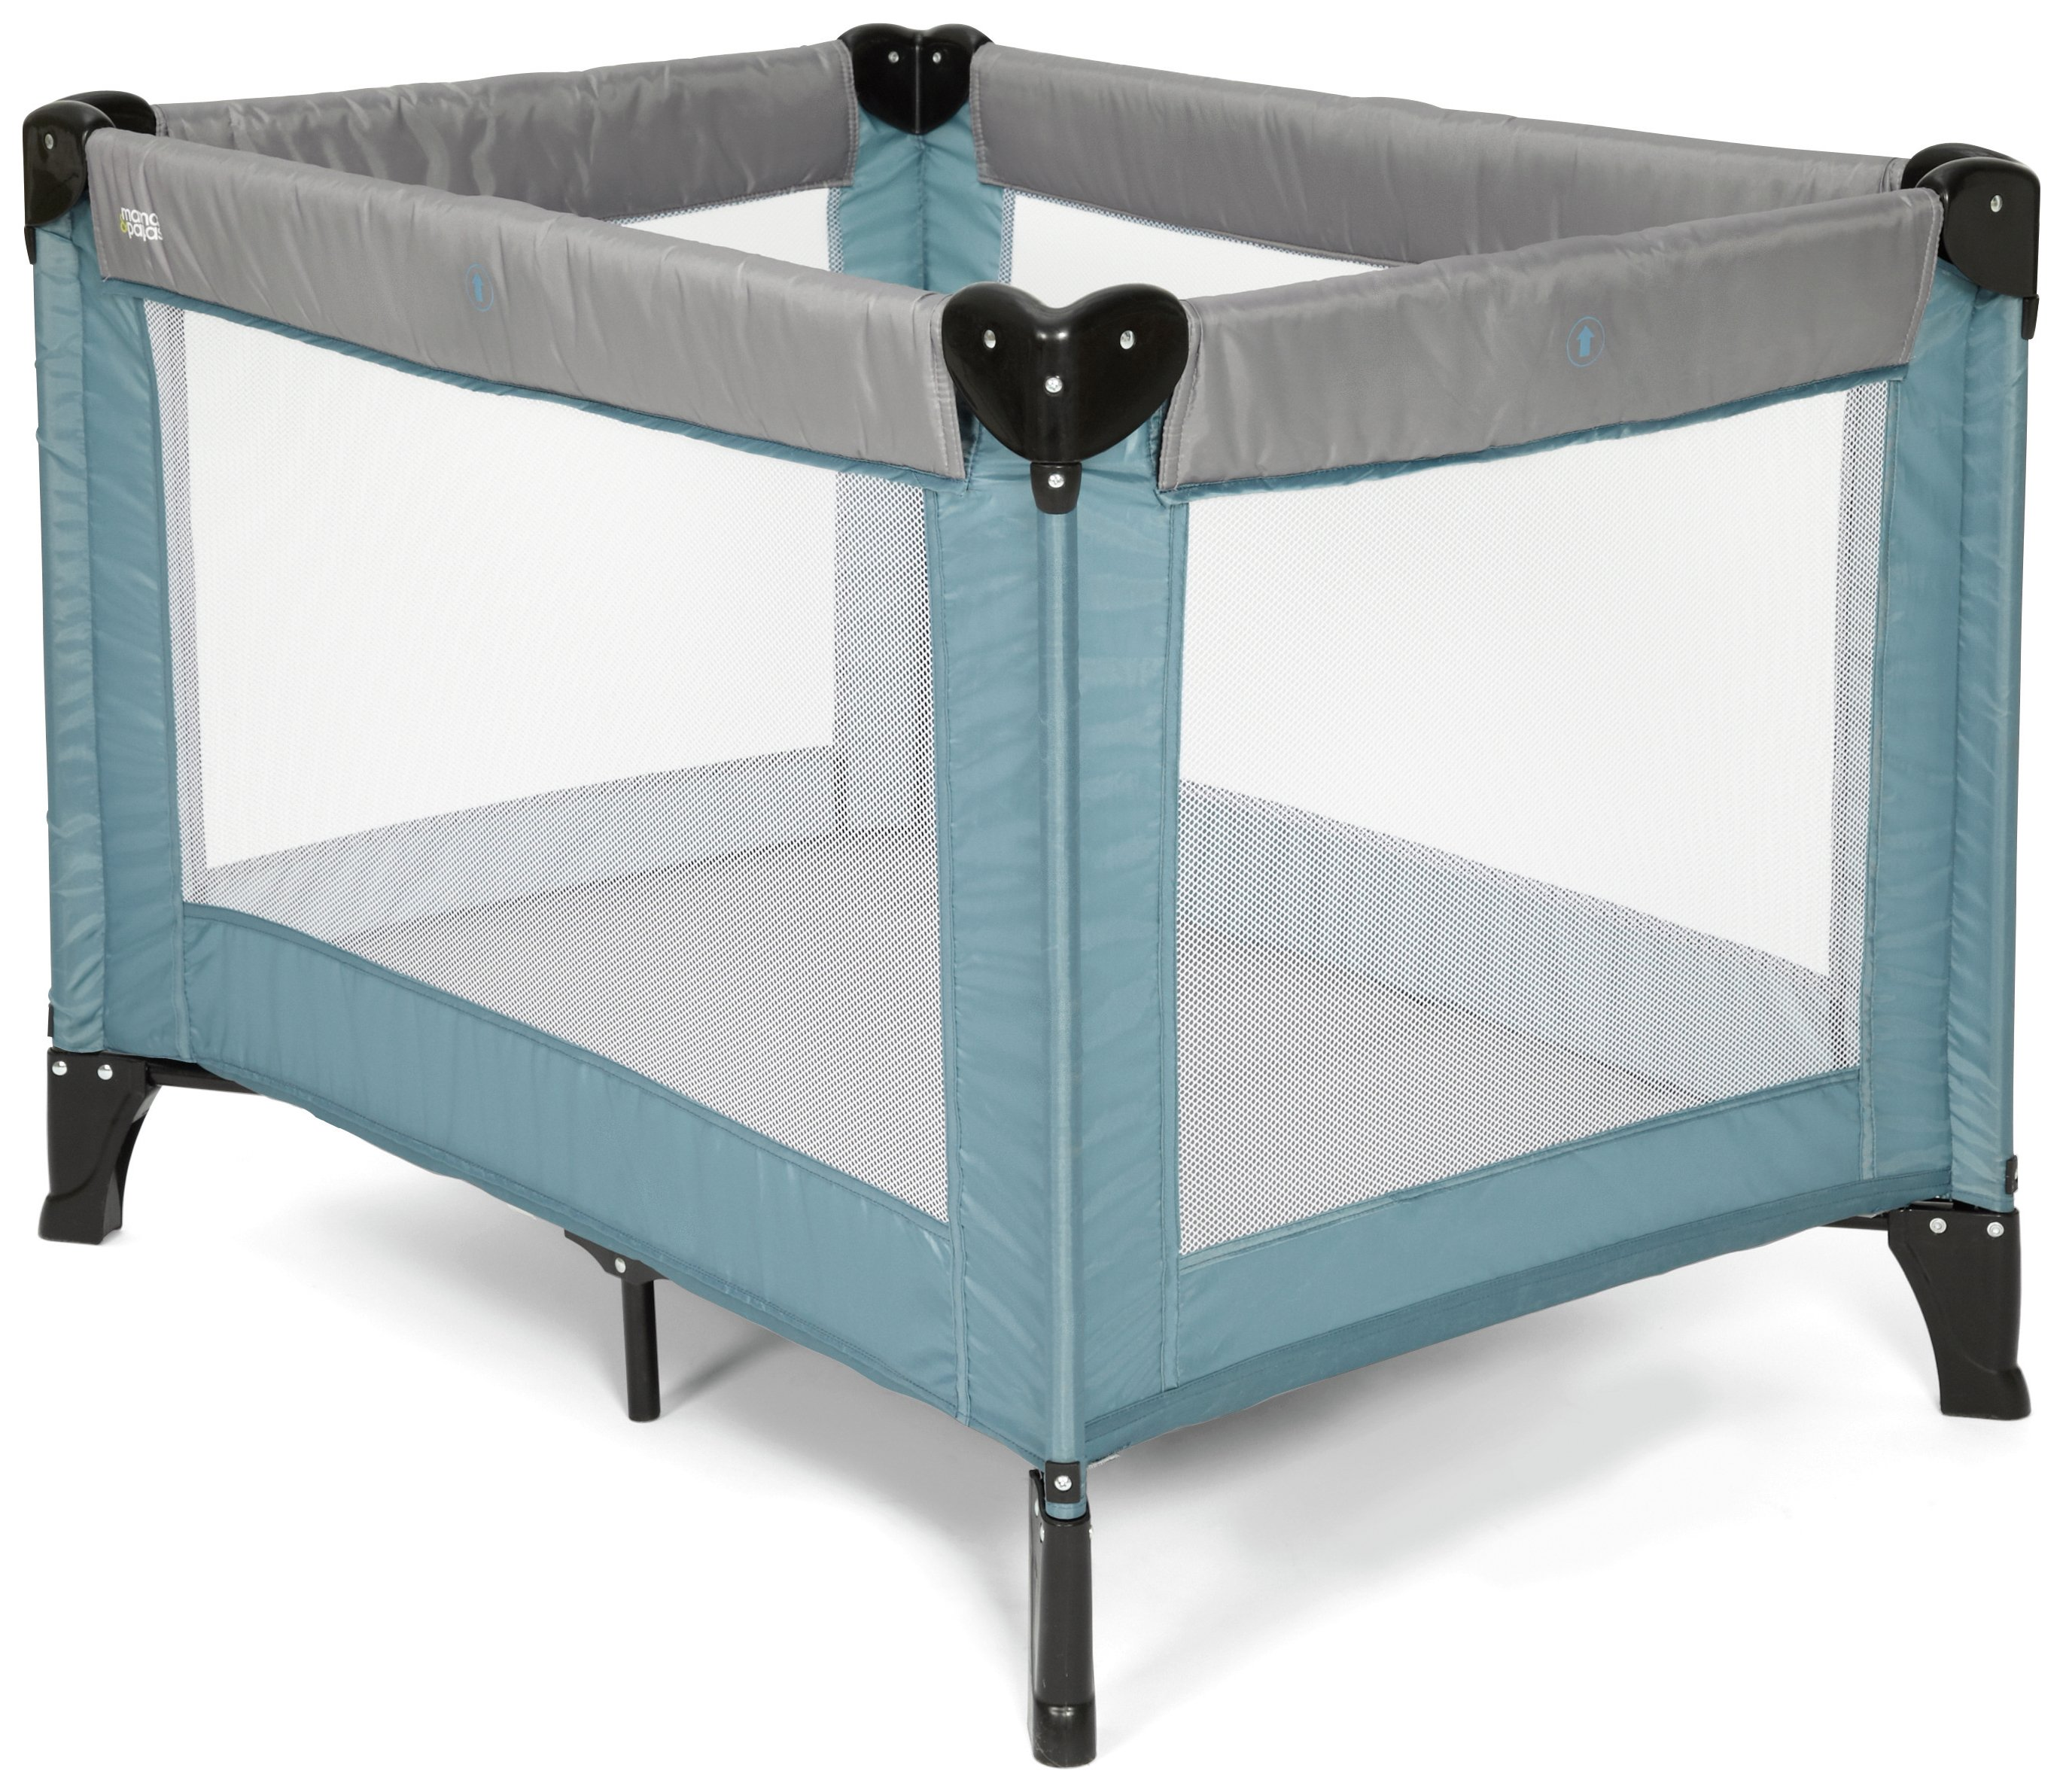 mamas papas classic travel cot review. Black Bedroom Furniture Sets. Home Design Ideas